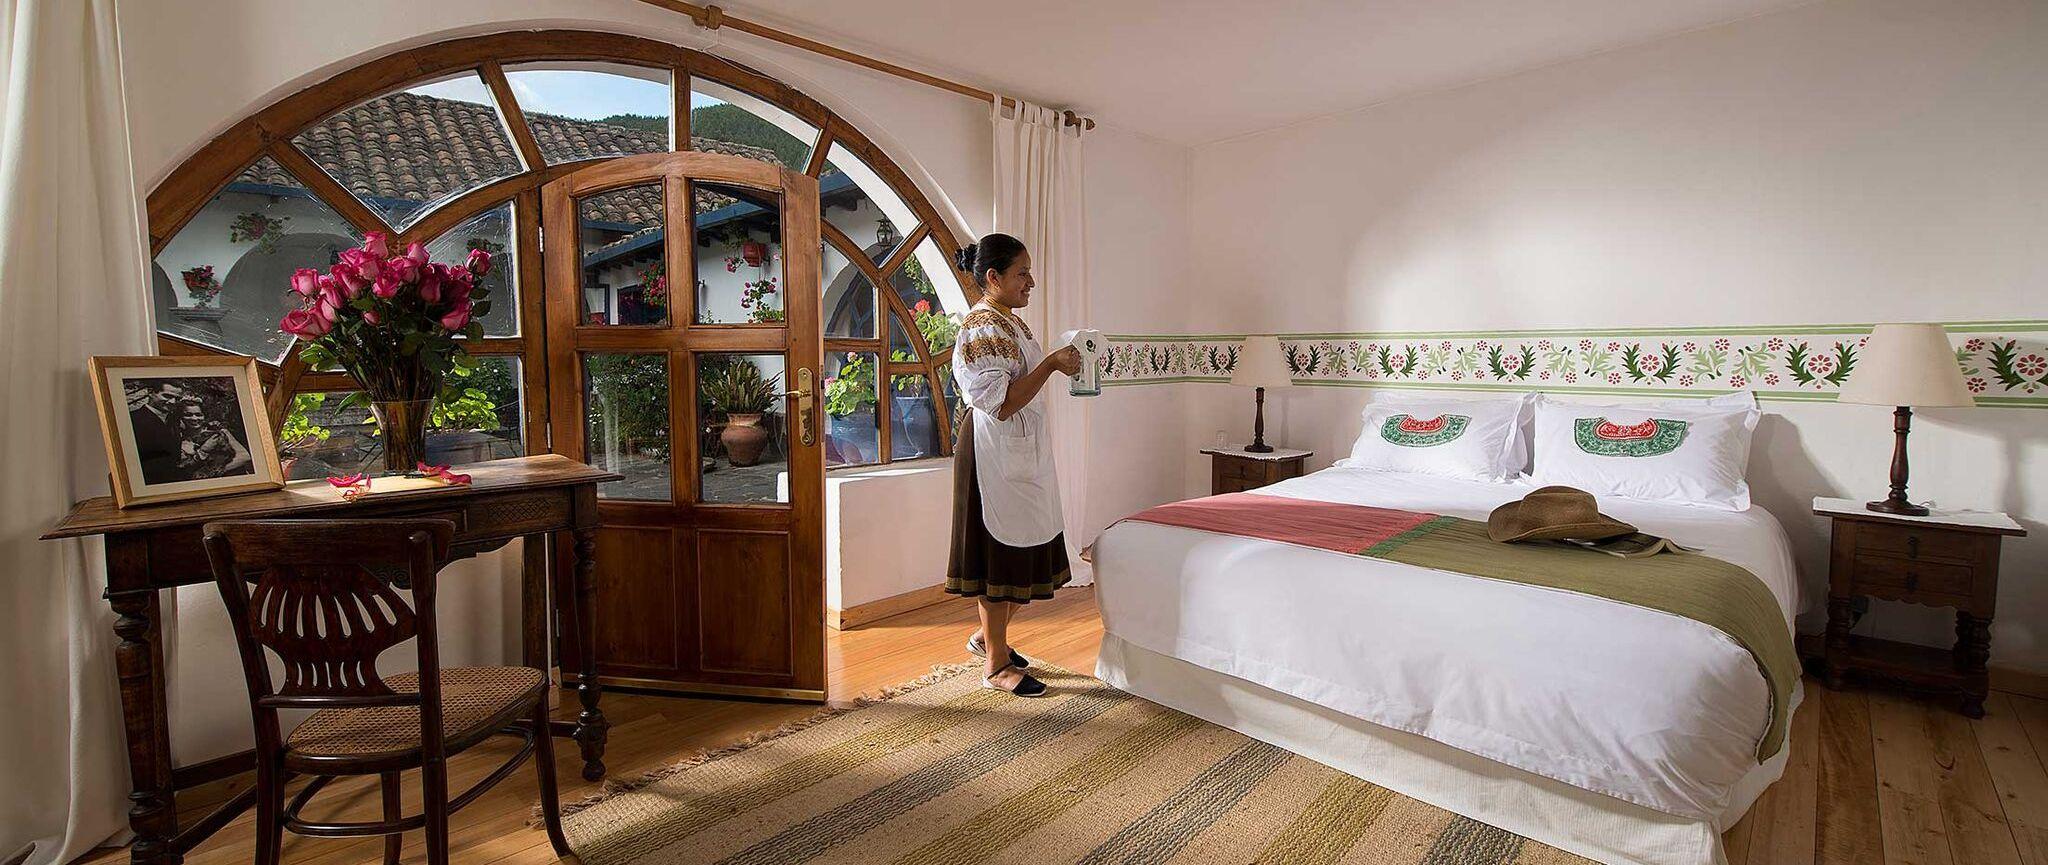 hacienda-zuleta-deluxe-room